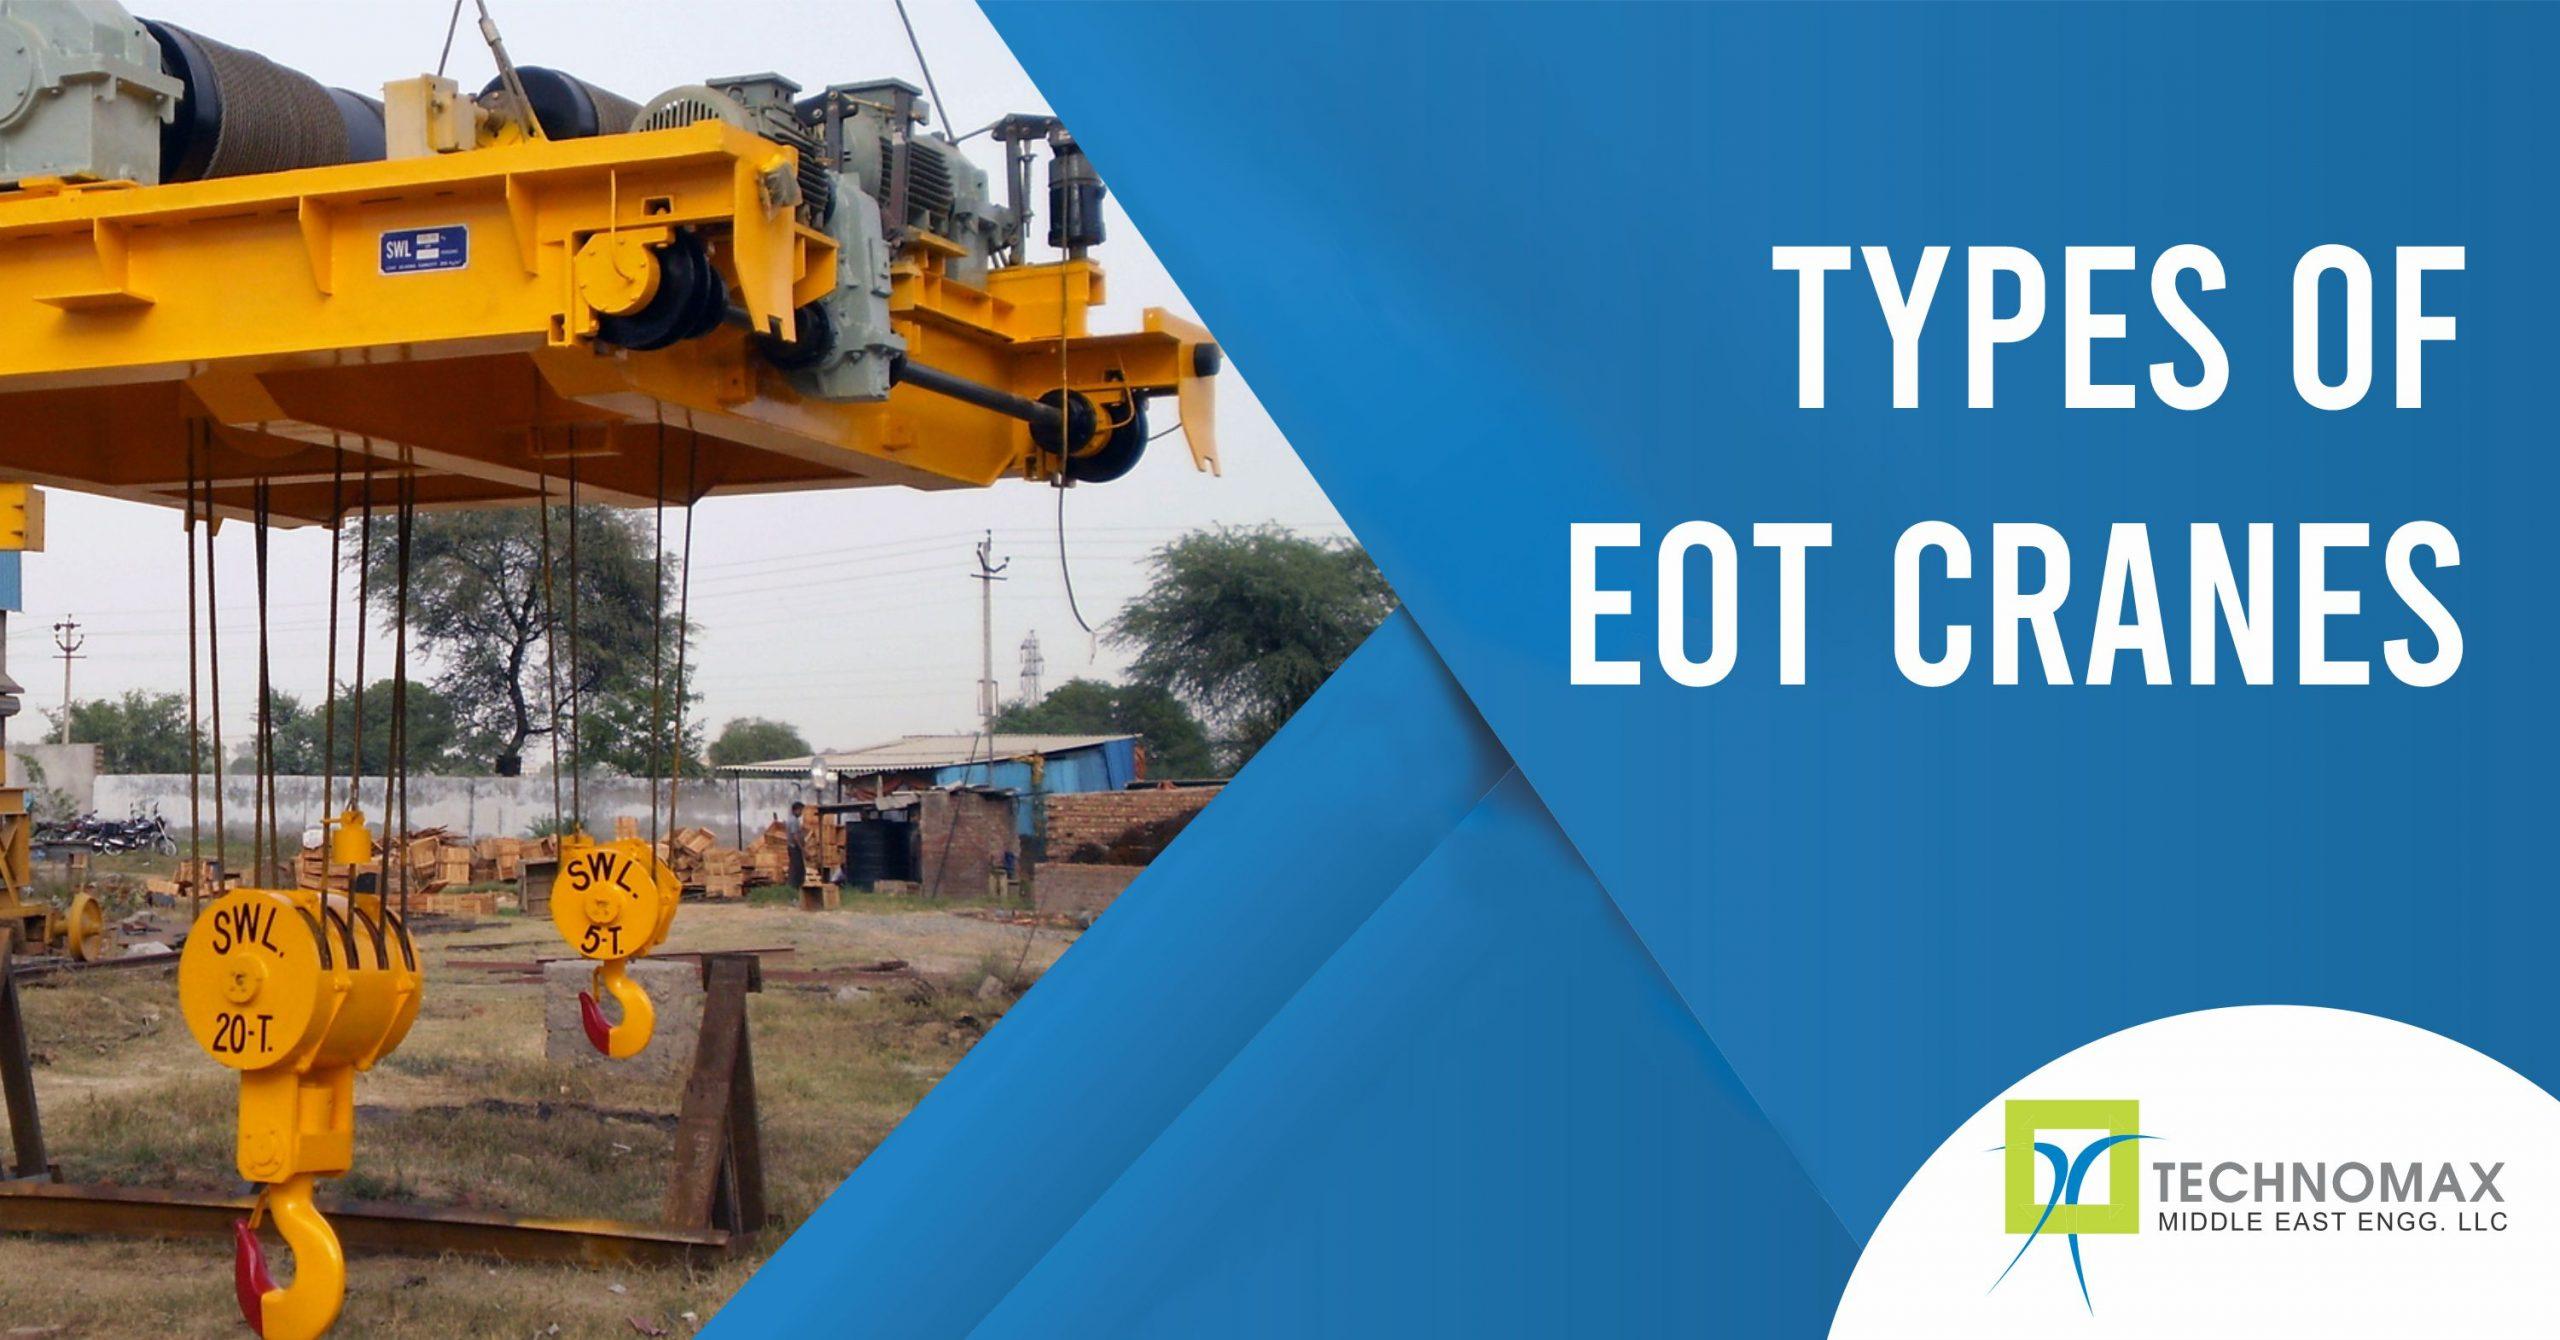 EOT Crane- Electric Overhead Travelling Cranes